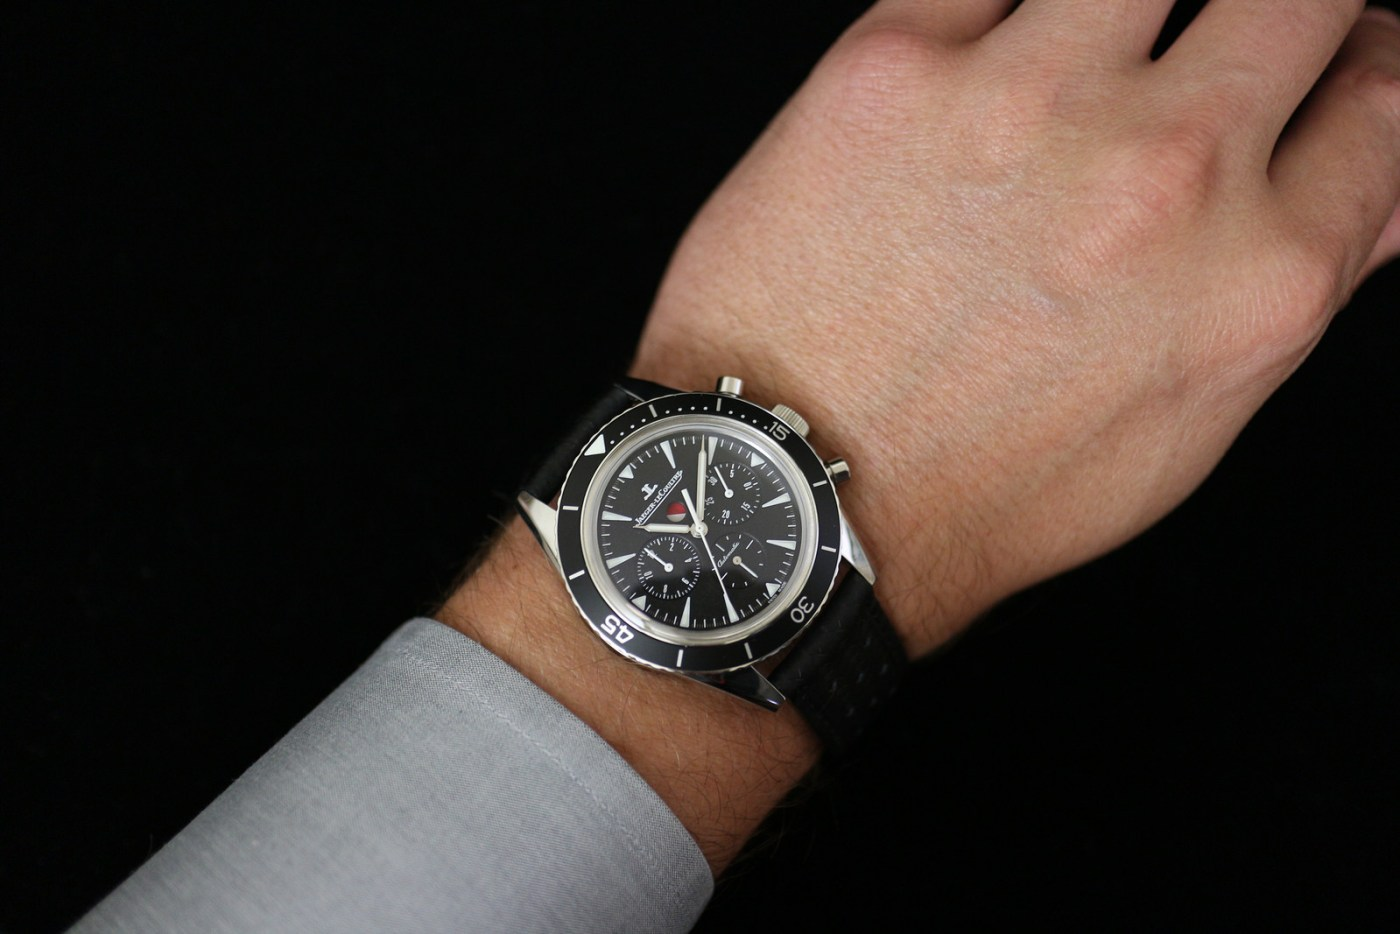 Jaeger-LeCoultre Deep Sea Chronograph with dress shirt